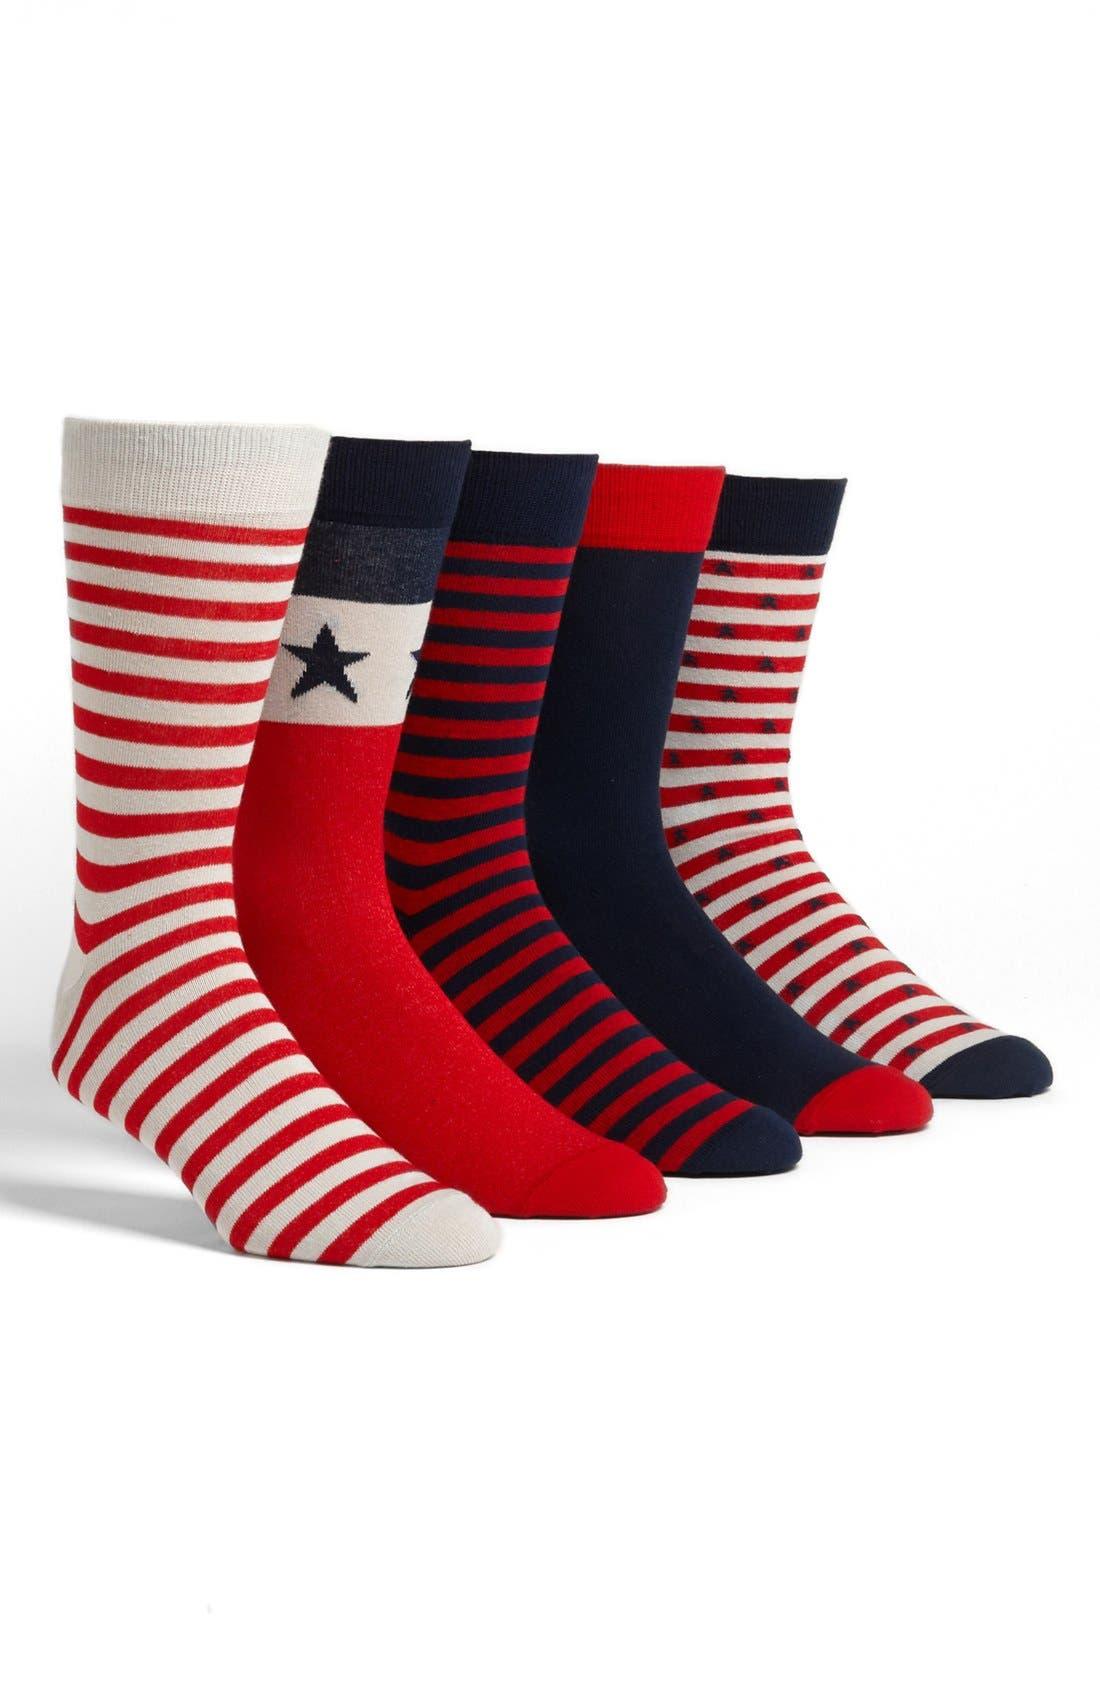 Main Image - Topman Americana Pattern Socks (Set of 5)